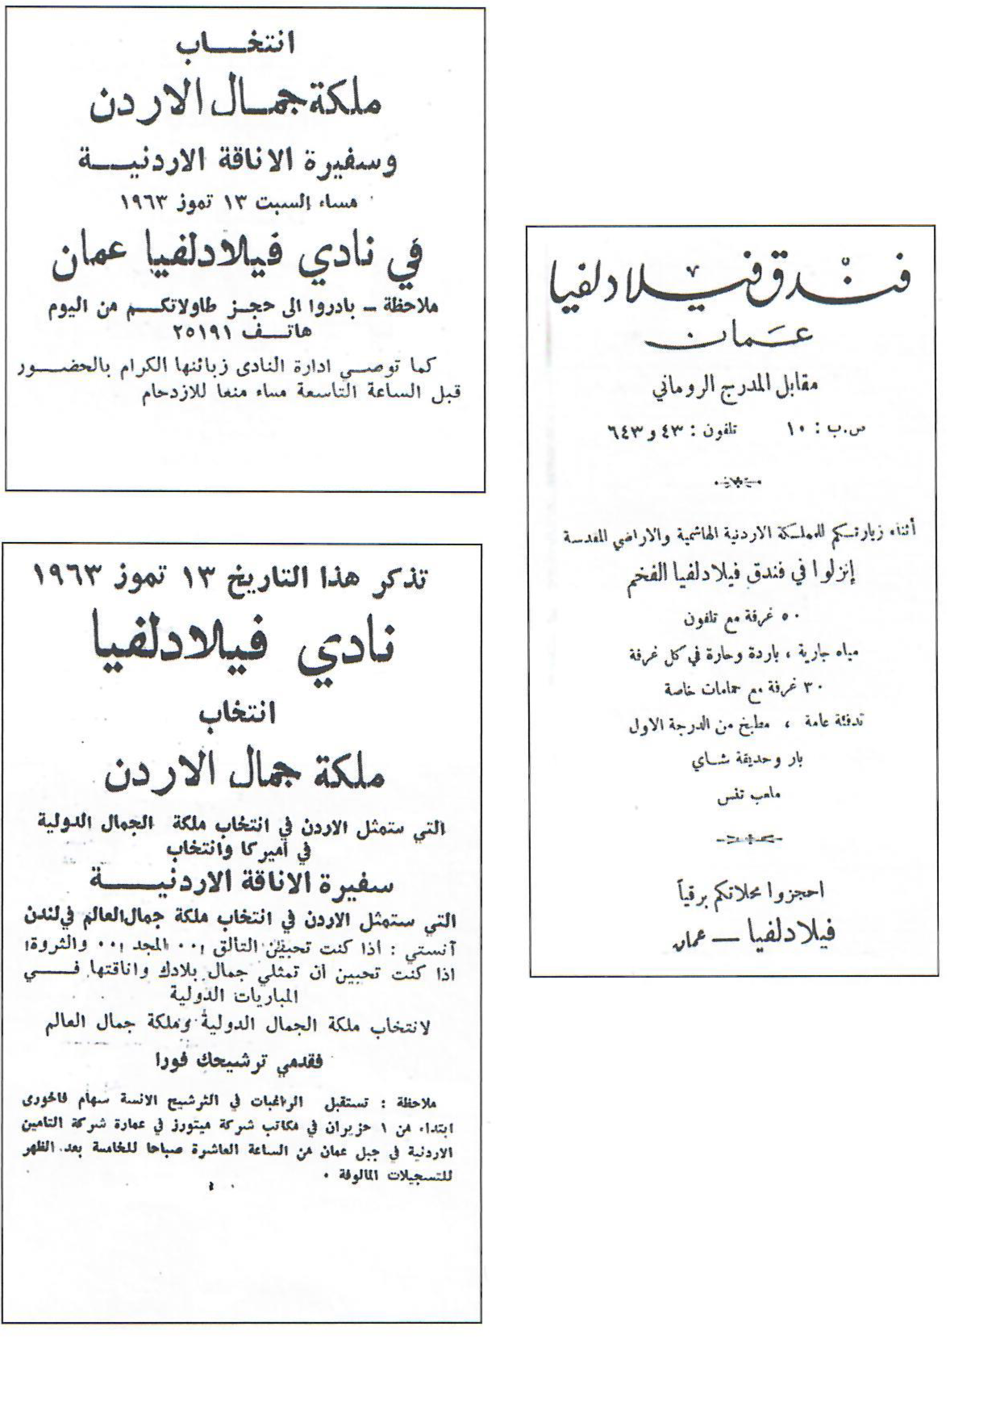 "Newspaper advertisements for the hotel from the 1960s. .إعلانات للفندق في الصحف تعود إلى عقد الستينات من القرن الماضي          Normal    0                false    false    false       EN-US    X-NONE    AR-SA                                                                                                                                                                                                                                                                                                                                                                                                                                                                                                                        /* Style Definitions */  table.MsoNormalTable {mso-style-name:""Table Normal""; mso-tstyle-rowband-size:0; mso-tstyle-colband-size:0; mso-style-noshow:yes; mso-style-priority:99; mso-style-parent:""""; mso-padding-alt:0cm 5.4pt 0cm 5.4pt; mso-para-margin-top:0cm; mso-para-margin-right:0cm; mso-para-margin-bottom:8.0pt; mso-para-margin-left:0cm; line-height:107%; mso-pagination:widow-orphan; font-size:11.0pt; font-family:""Calibri"",""sans-serif""; mso-ascii-font-family:Calibri; mso-ascii-theme-font:minor-latin; mso-hansi-font-family:Calibri; mso-hansi-theme-font:minor-latin; mso-bidi-font-family:Arial; mso-bidi-theme-font:minor-bidi;}"